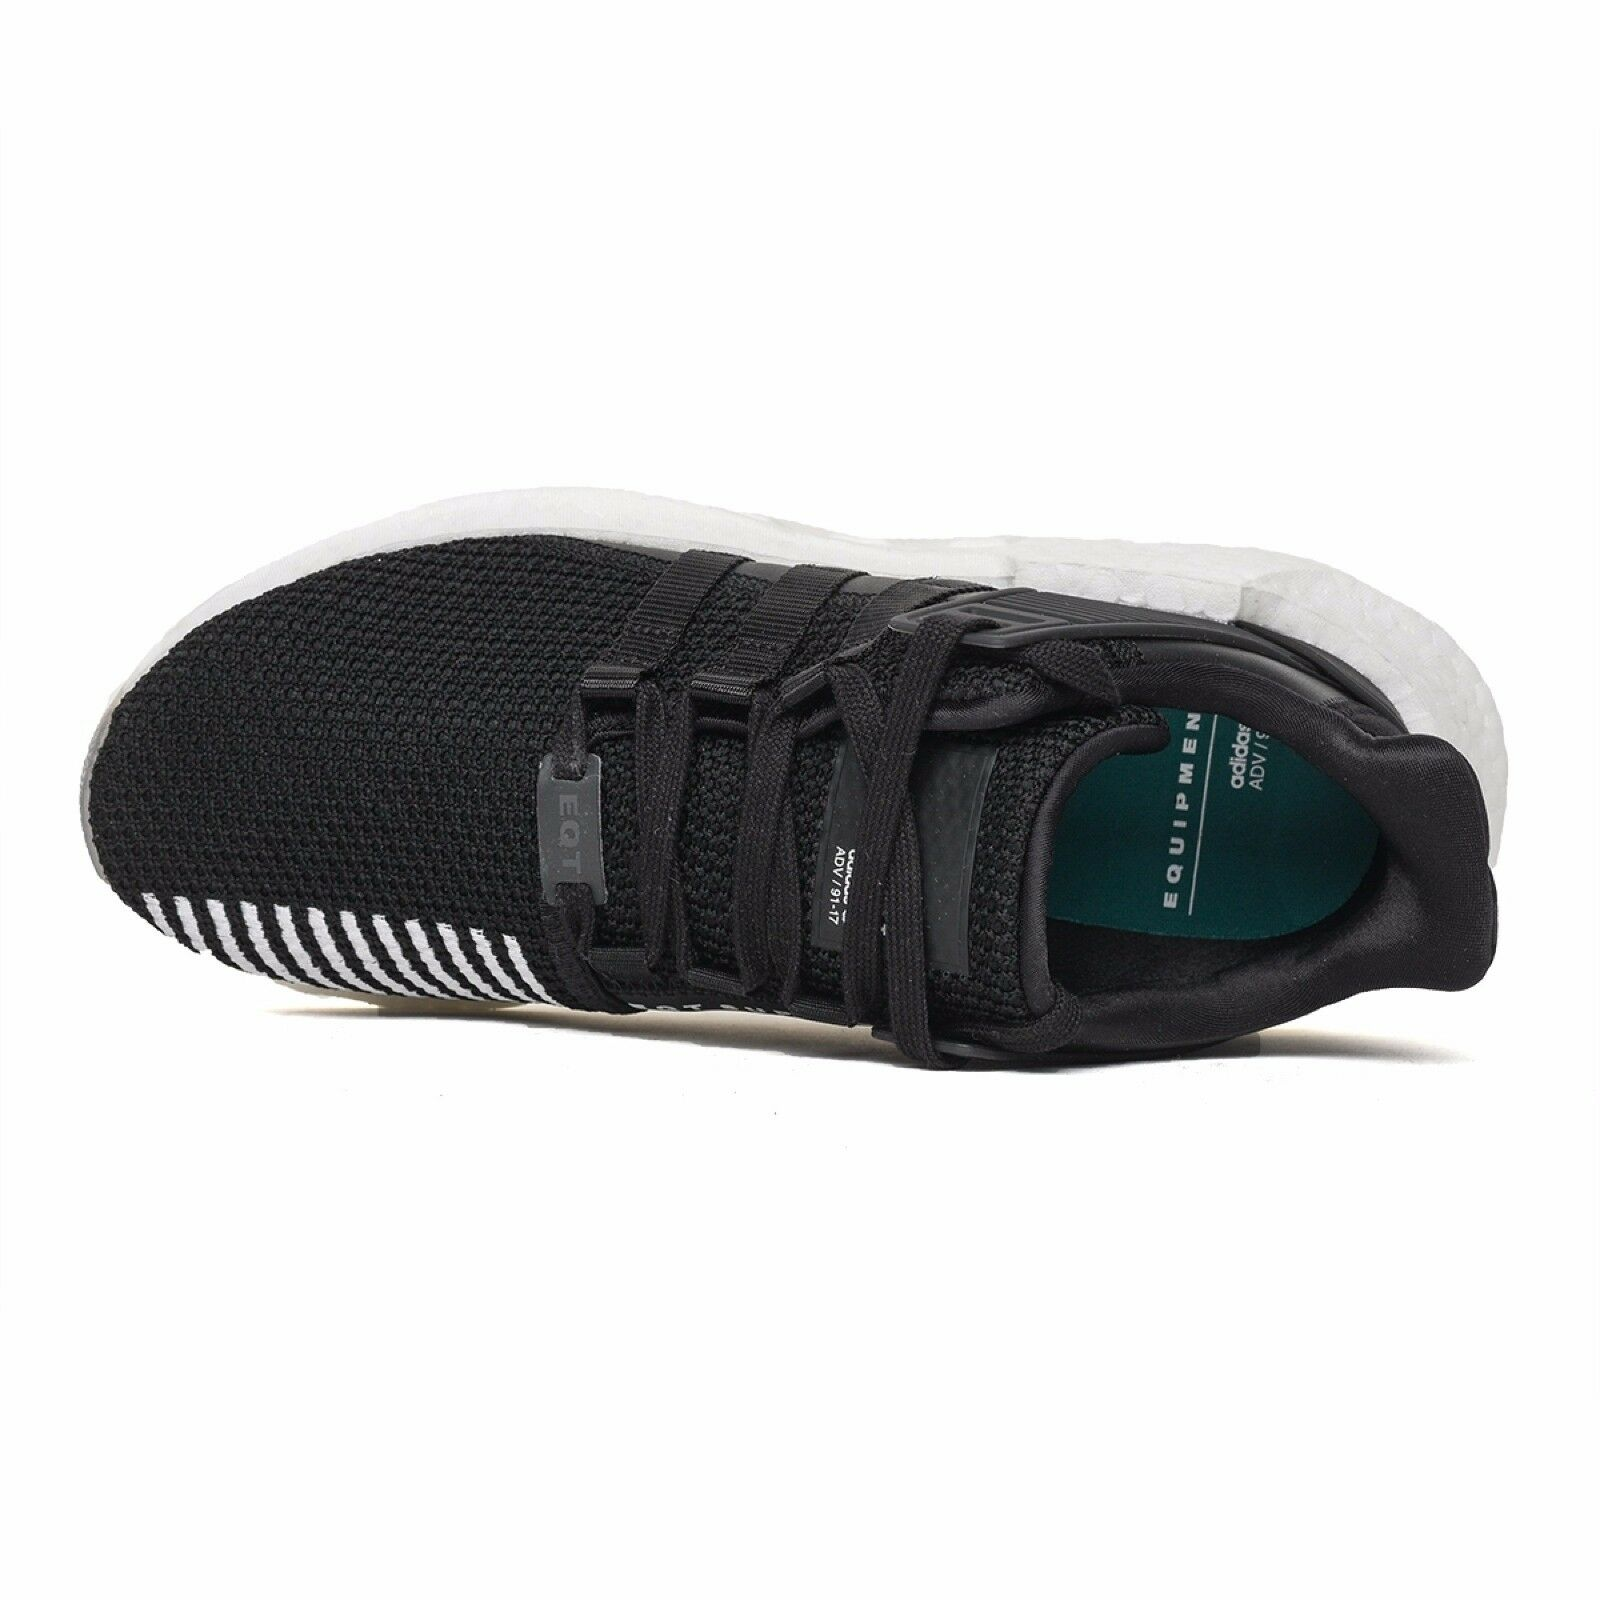 Adidas originals EQT SUPPORT 93 17 BZ0585 BZ0585 BZ0585 UK8.5 OG EQUIPMENT NMD BOOST ZX ADV DS b782ed